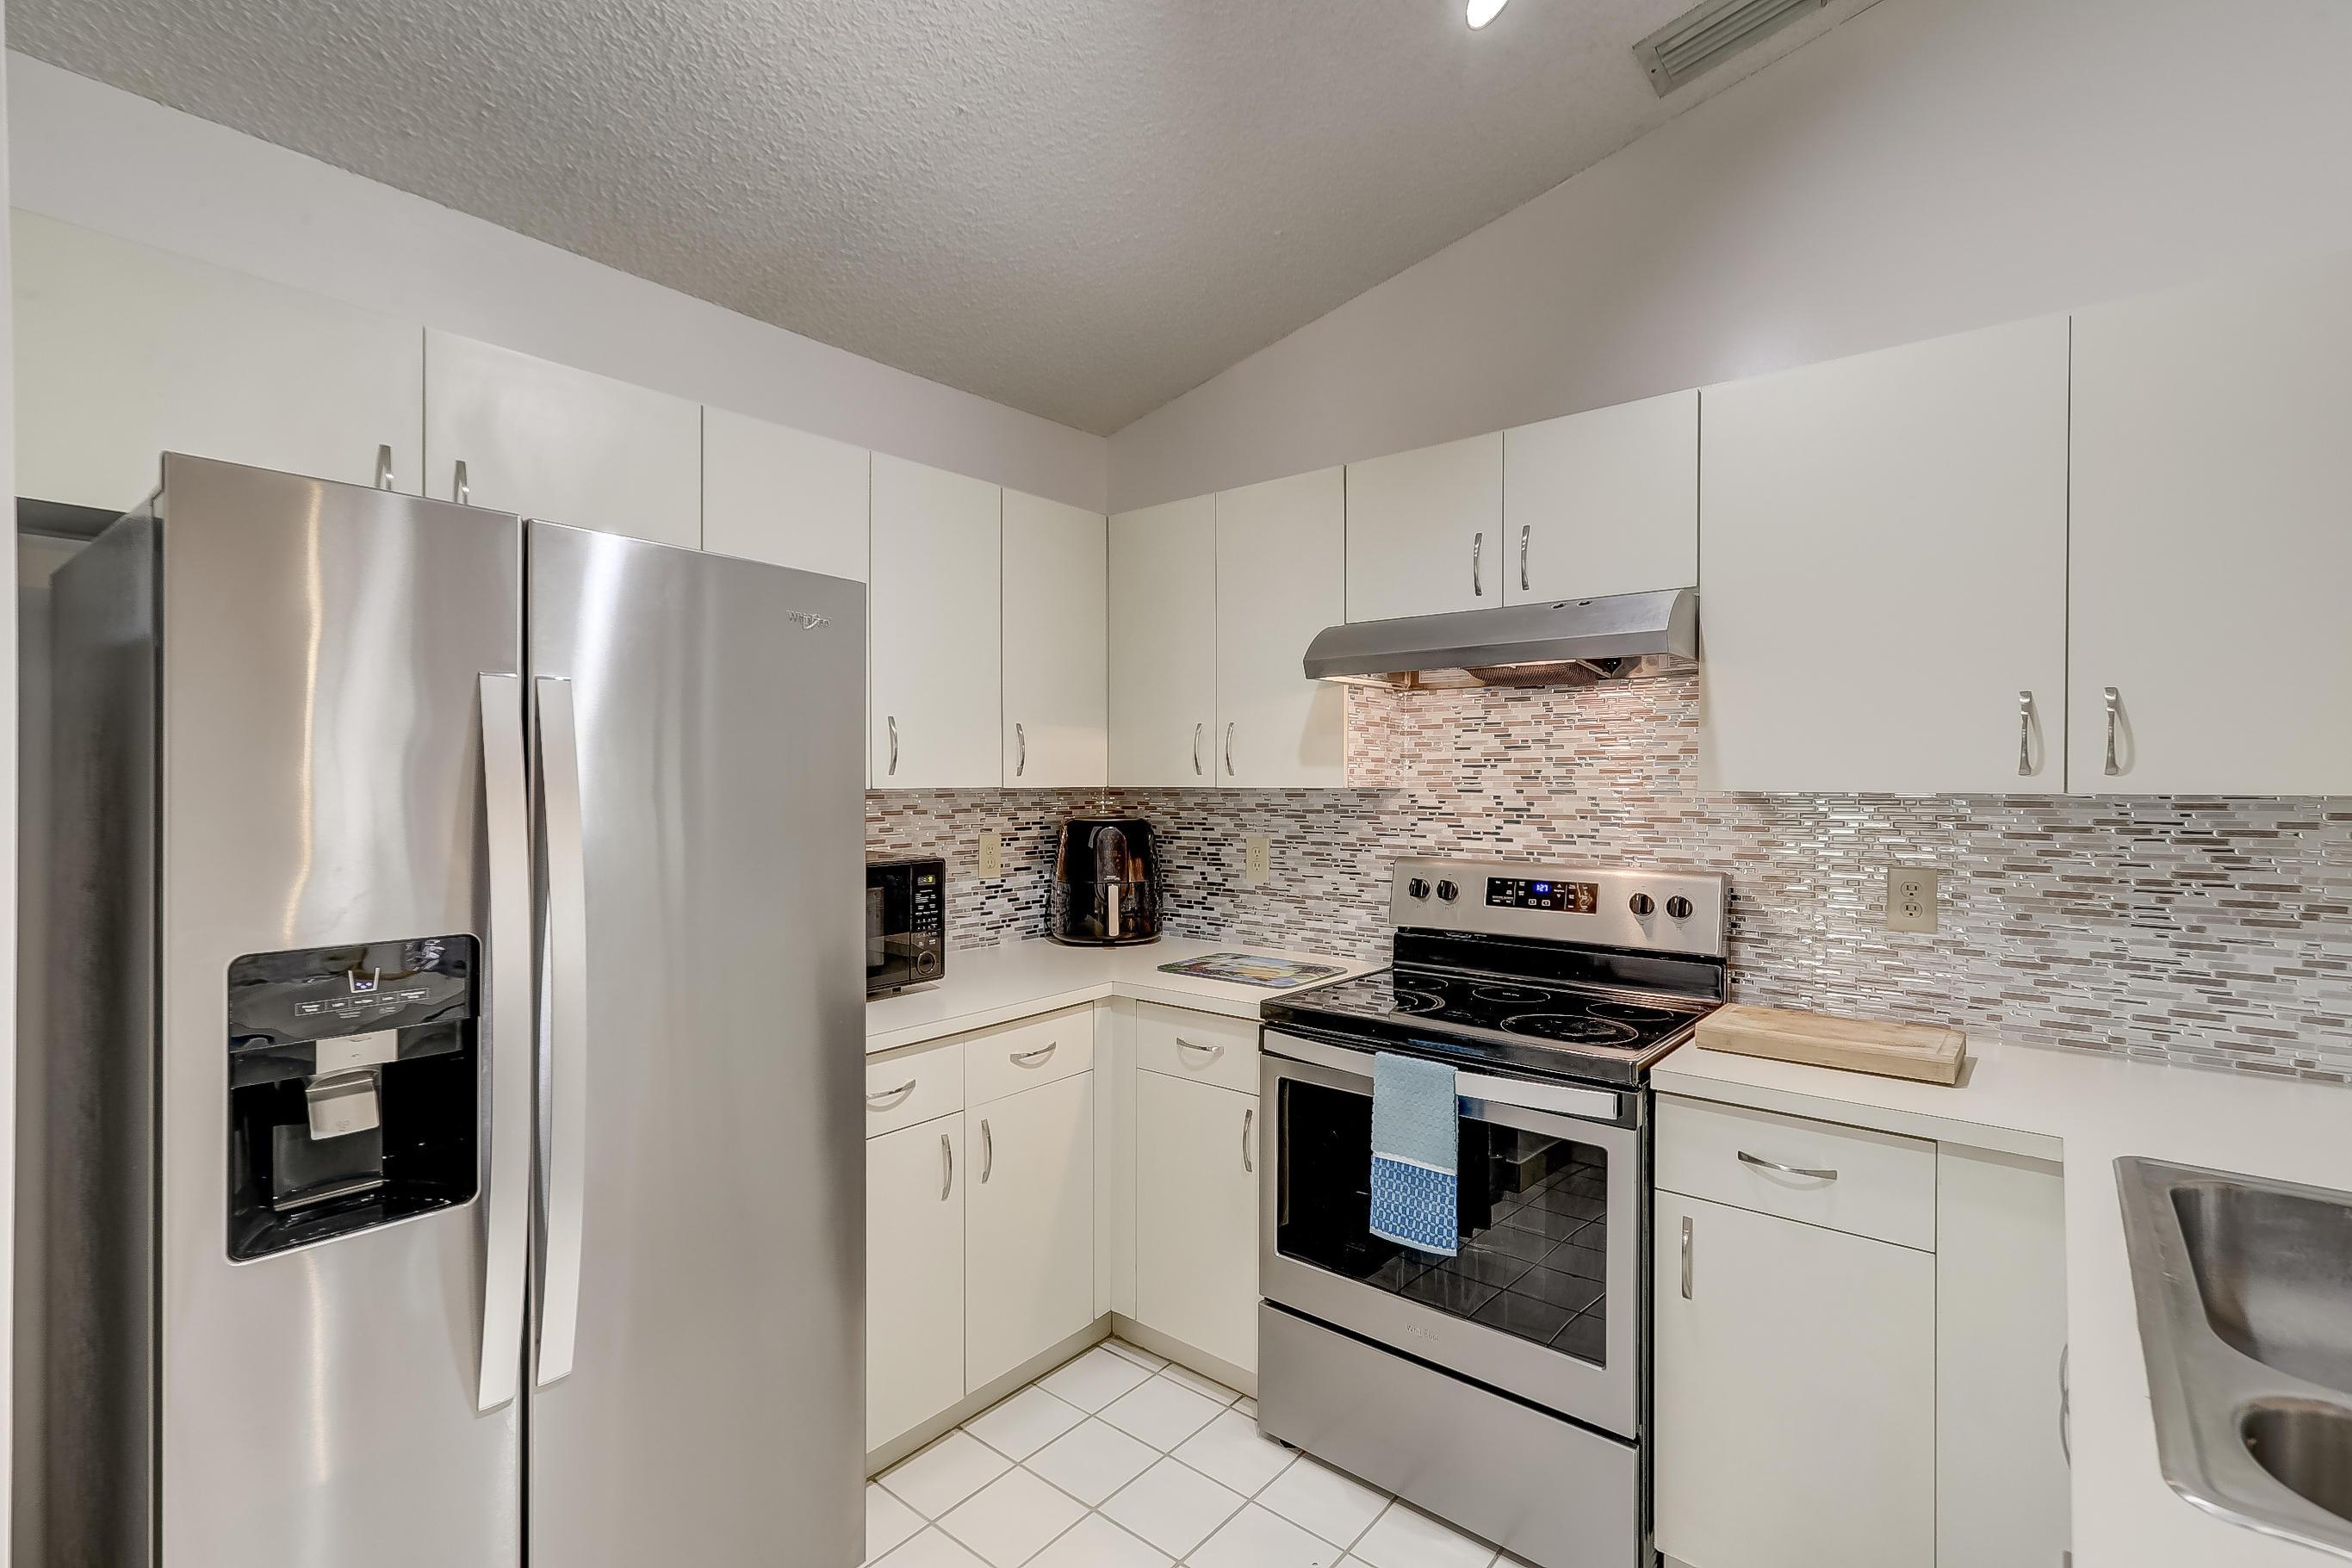 402 SW 158th Terrace 204 Pembroke Pines, FL 33027 photo 20